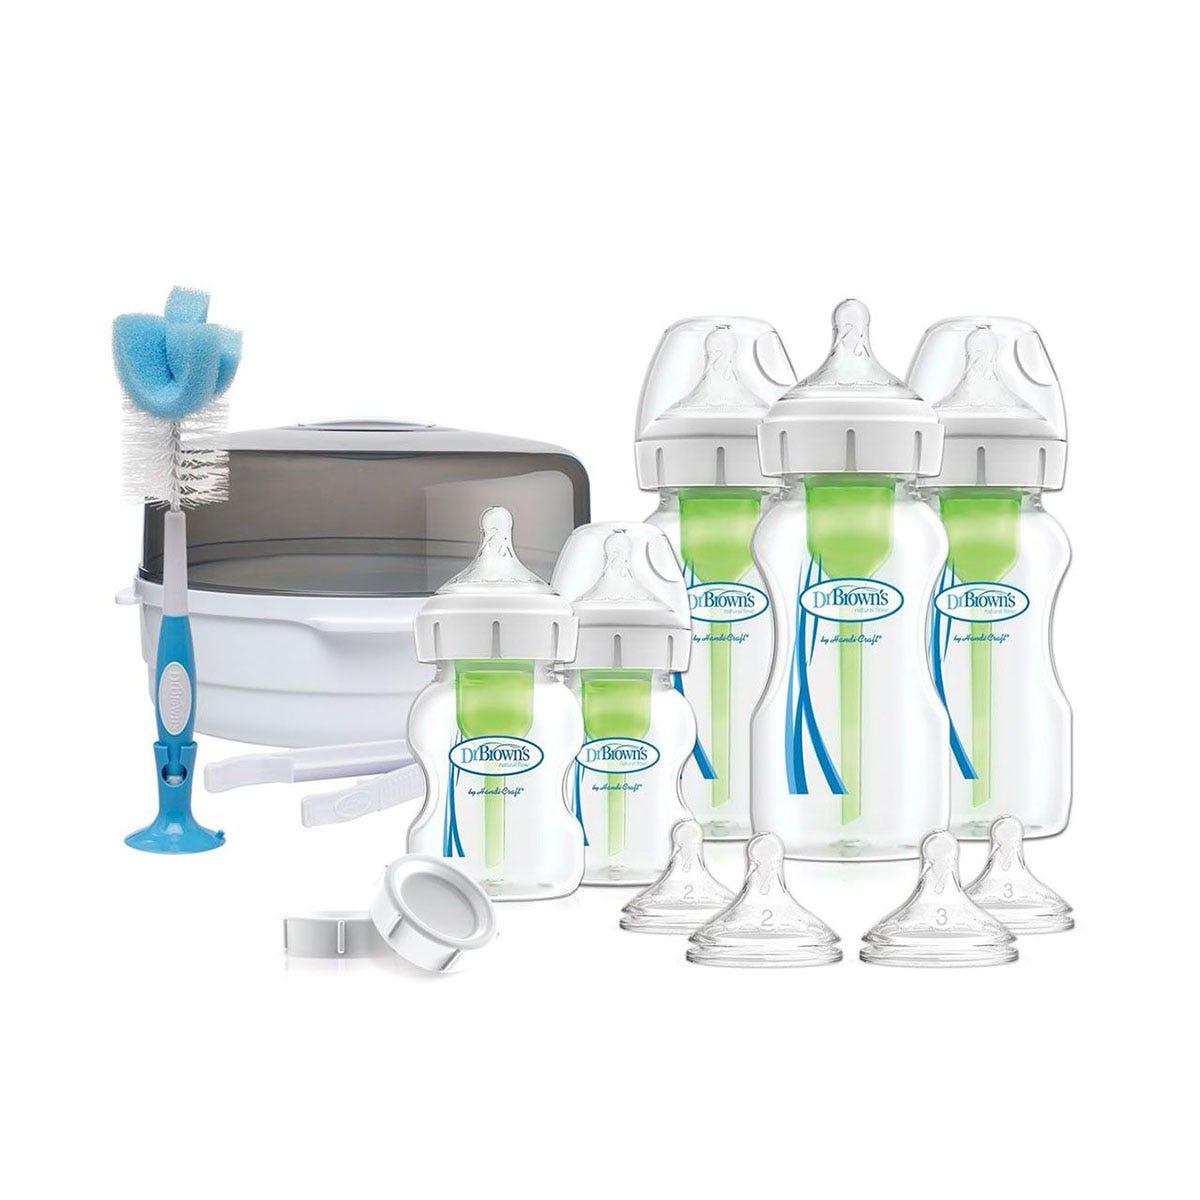 Dr Browns DBAC167 Options Bottle and Steriliser Gift Set - White